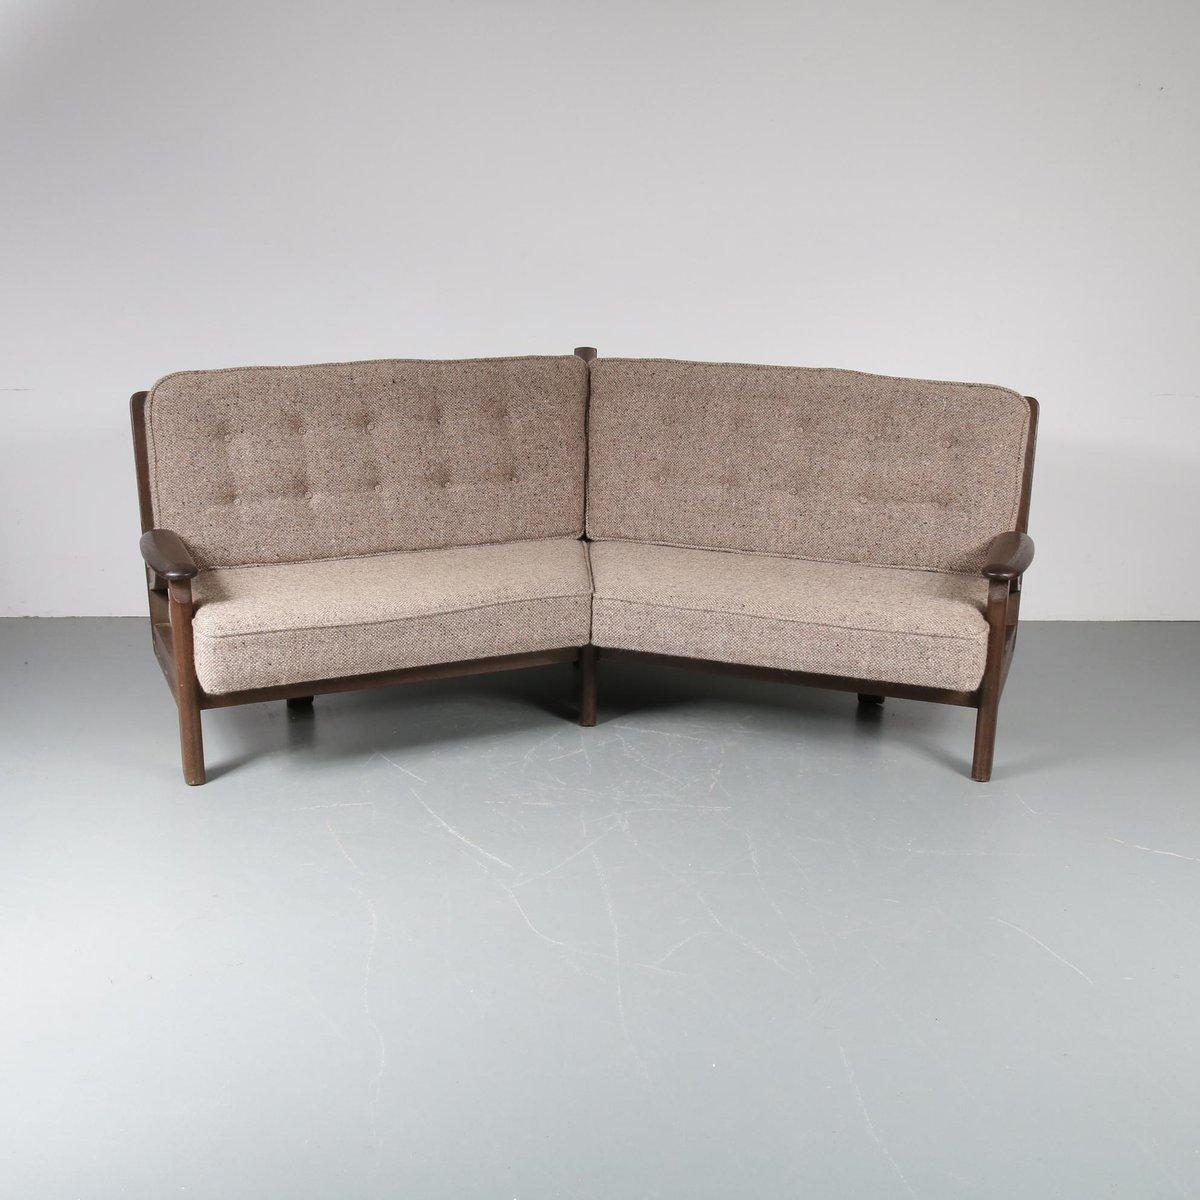 Corner Sofa Sale London: Corner Sofa By Guillerme Et Chambron, 1940s For Sale At Pamono